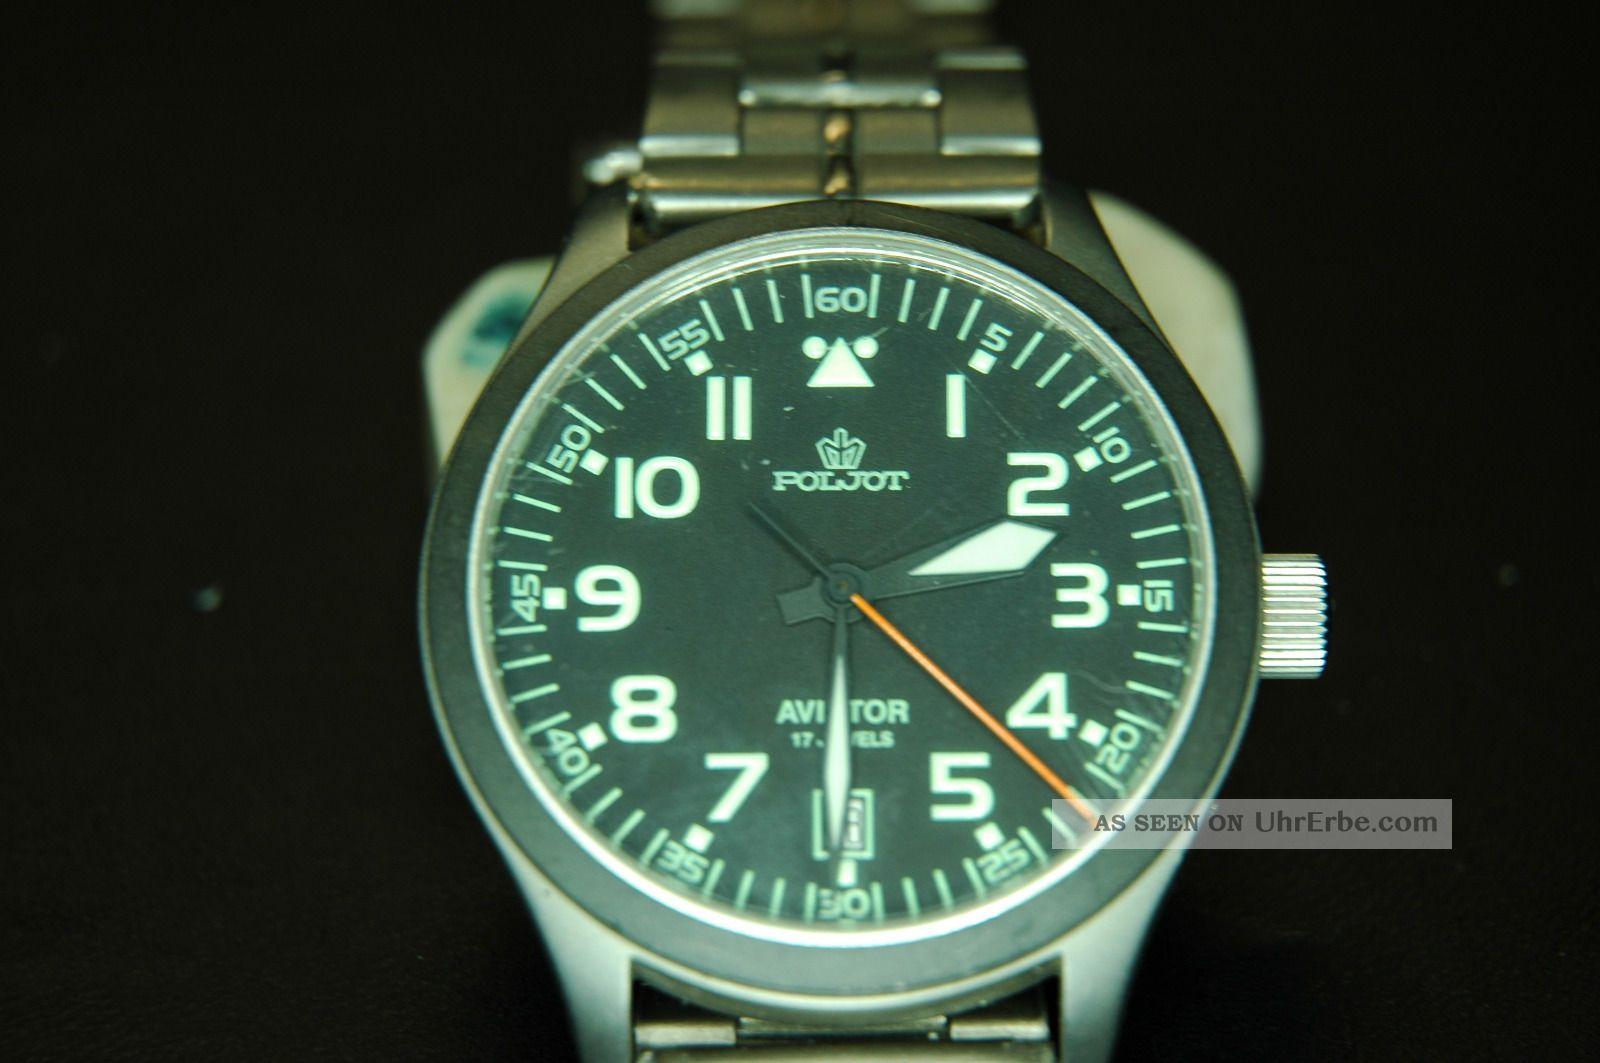 Armbanduhr,  Poljot,  Fliegerchrono,  Titanrmband,  Edelstahl - Gehäuse Armbanduhren Bild